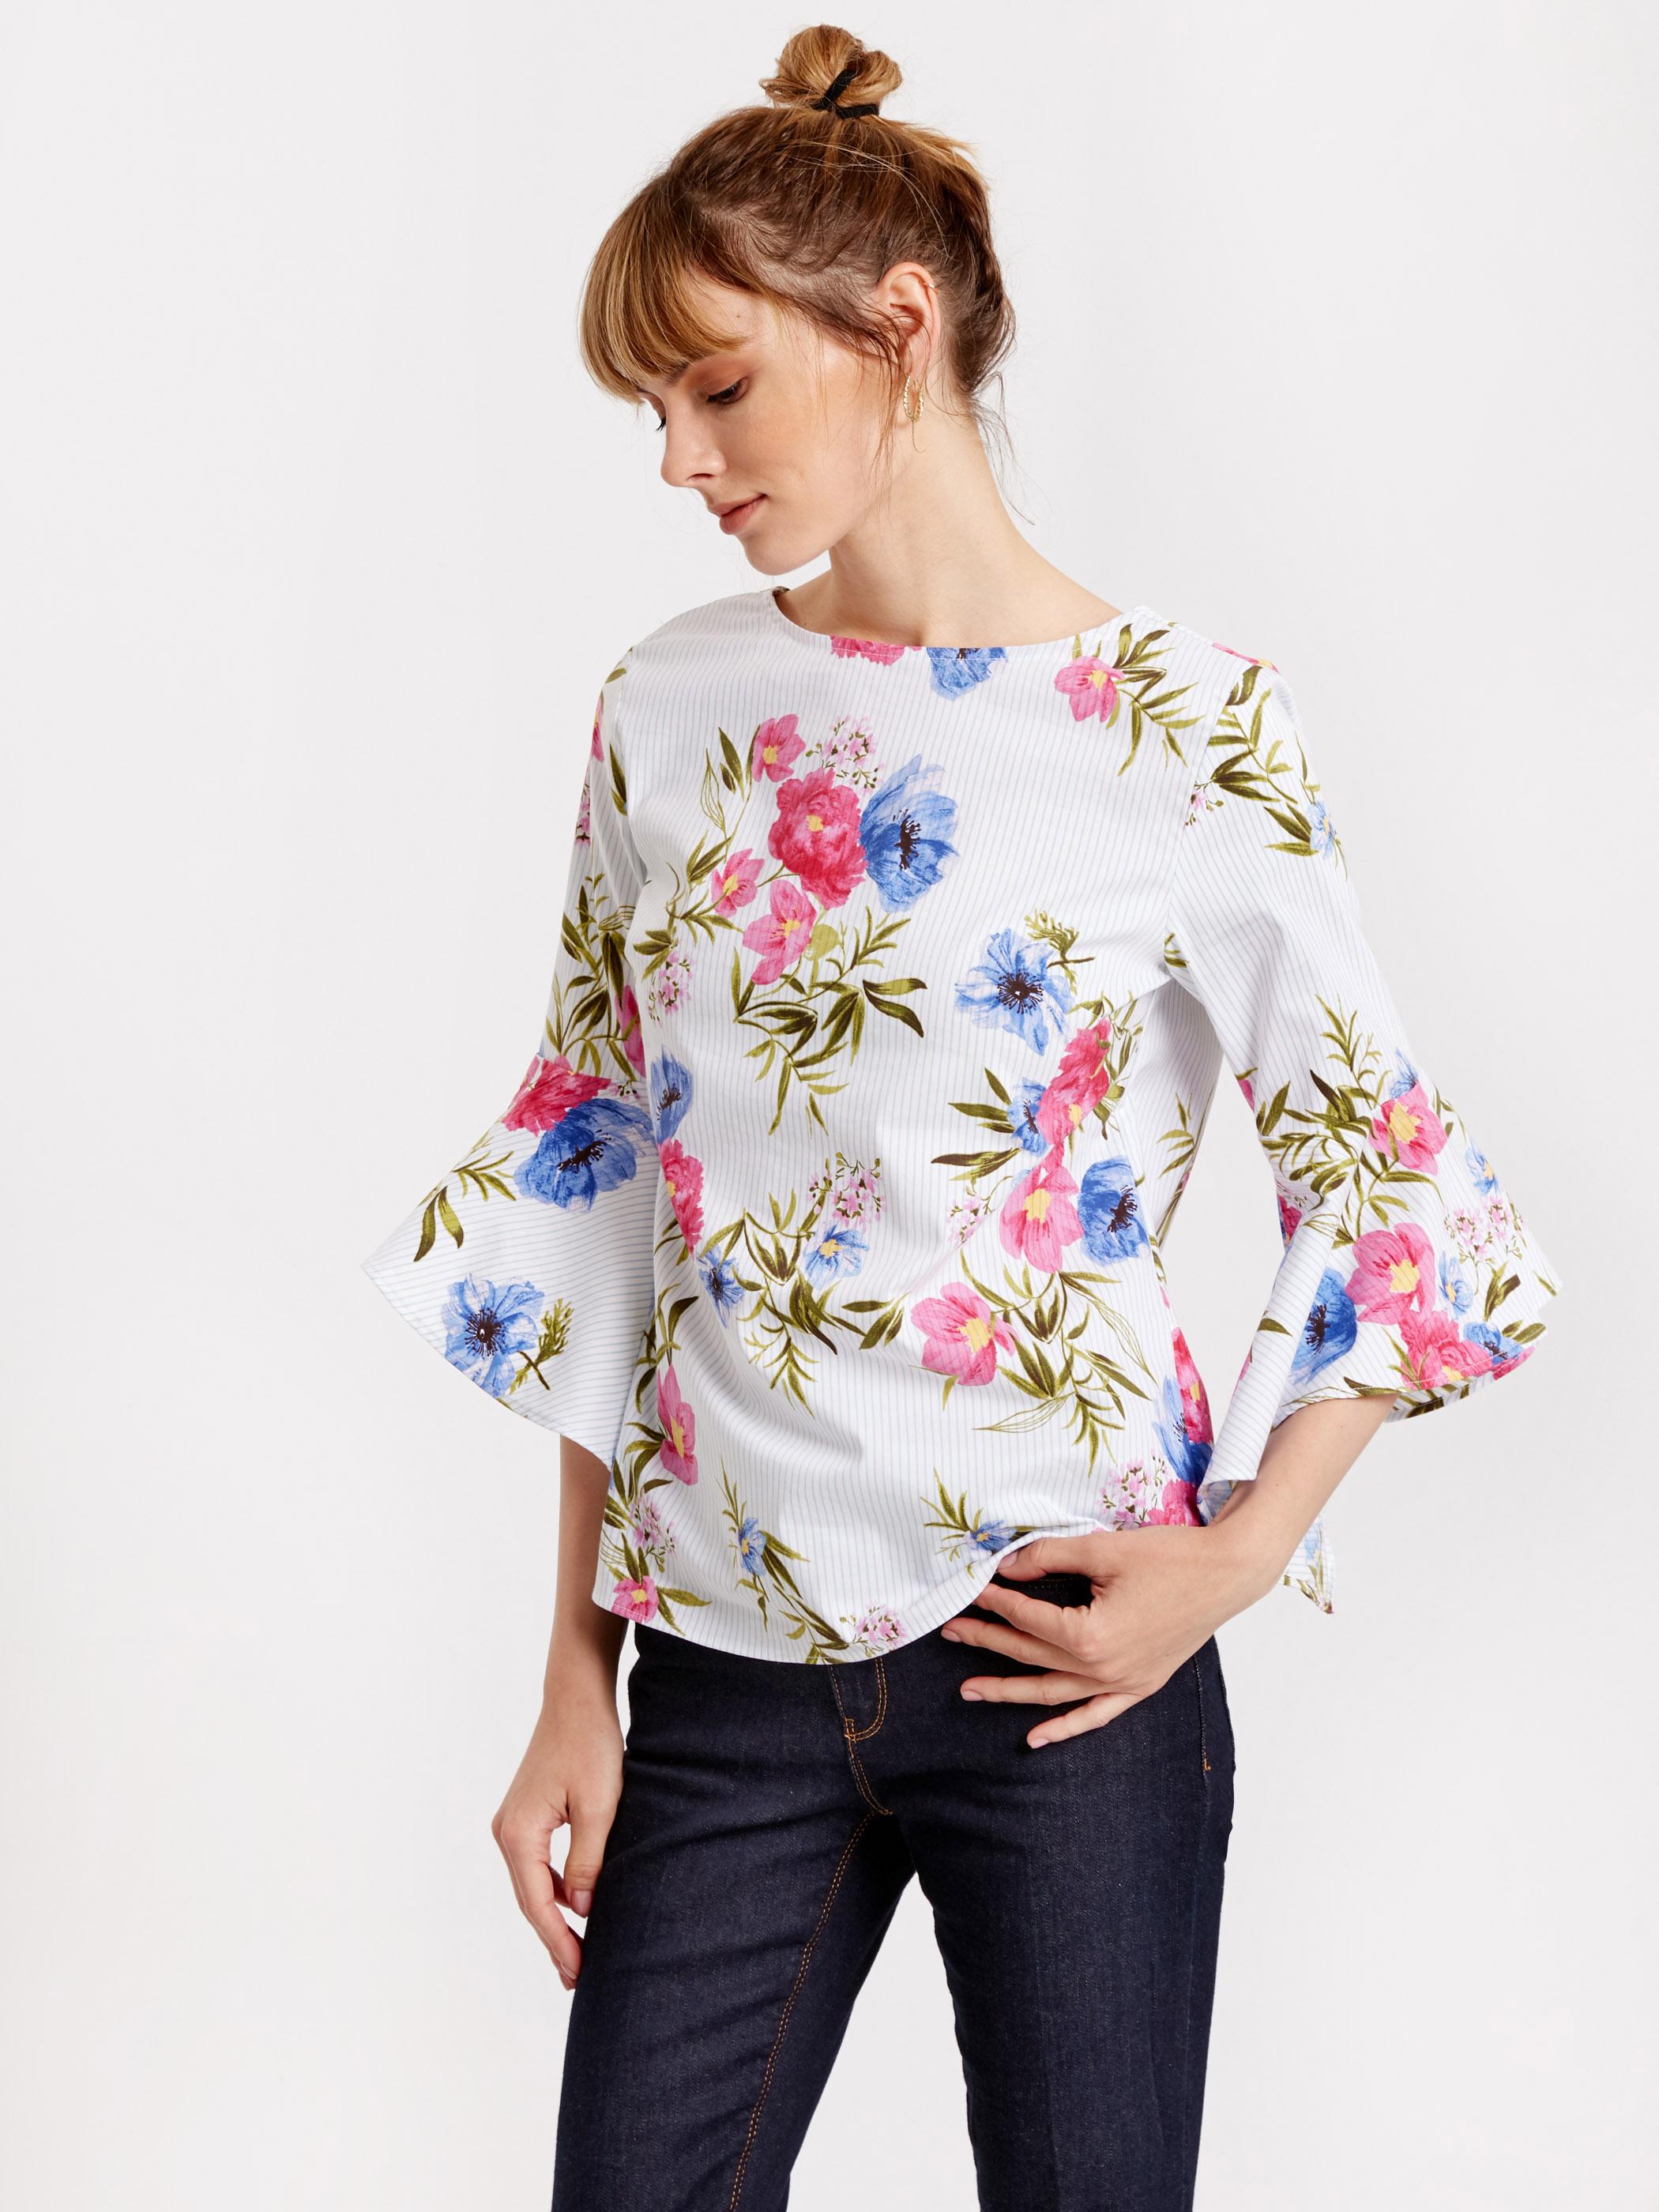 Блузка из поплина с воланами на рукавах